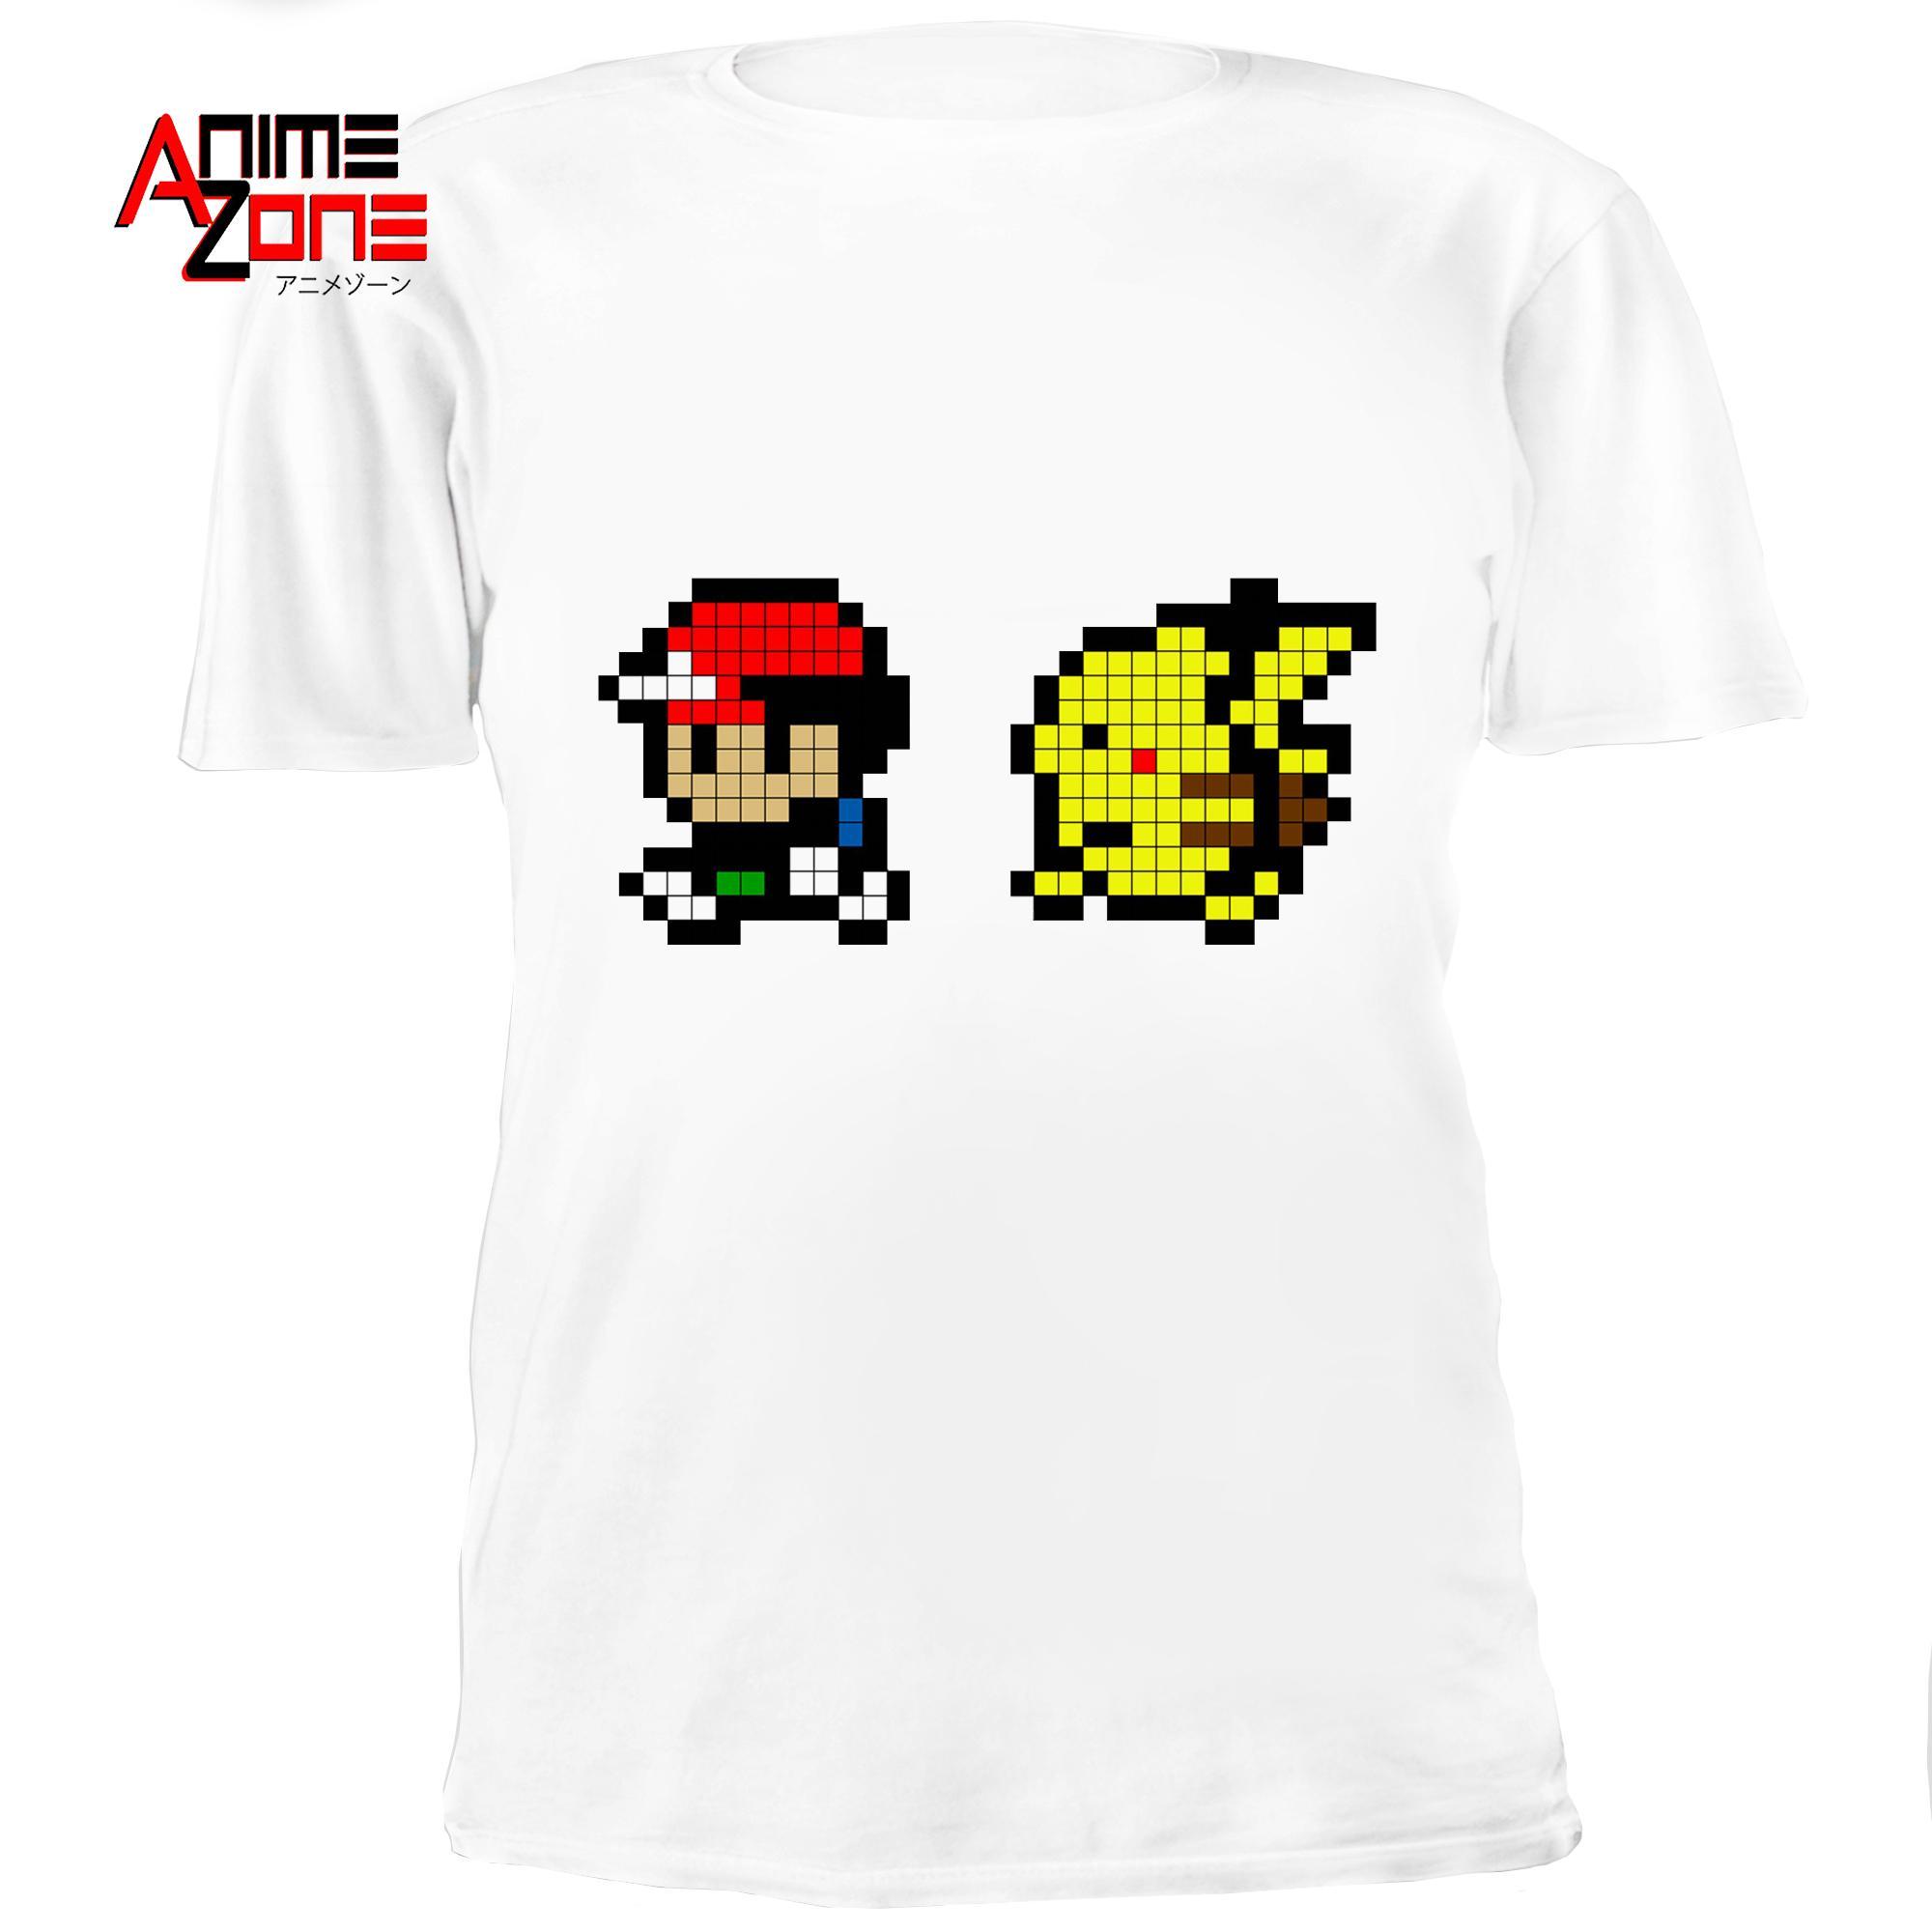 90b0525f Anime Zone POKEMON Edition Cotton Tops Printed Unisex T-Shirt (White)